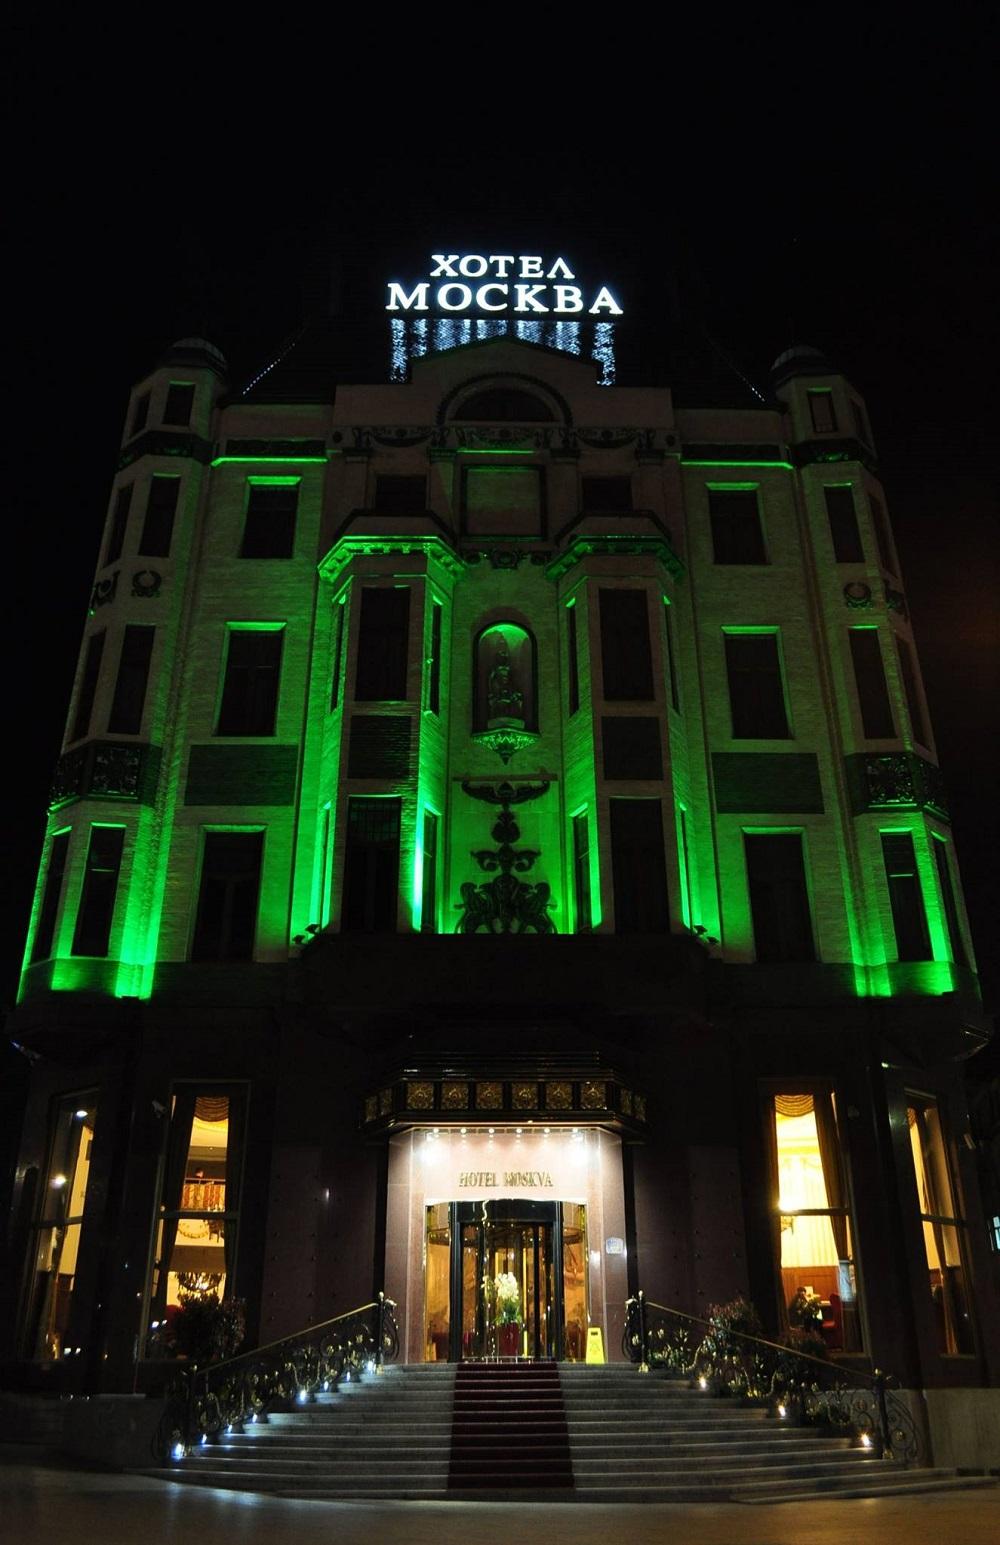 Zeleni Beograd - Hotel Moskva